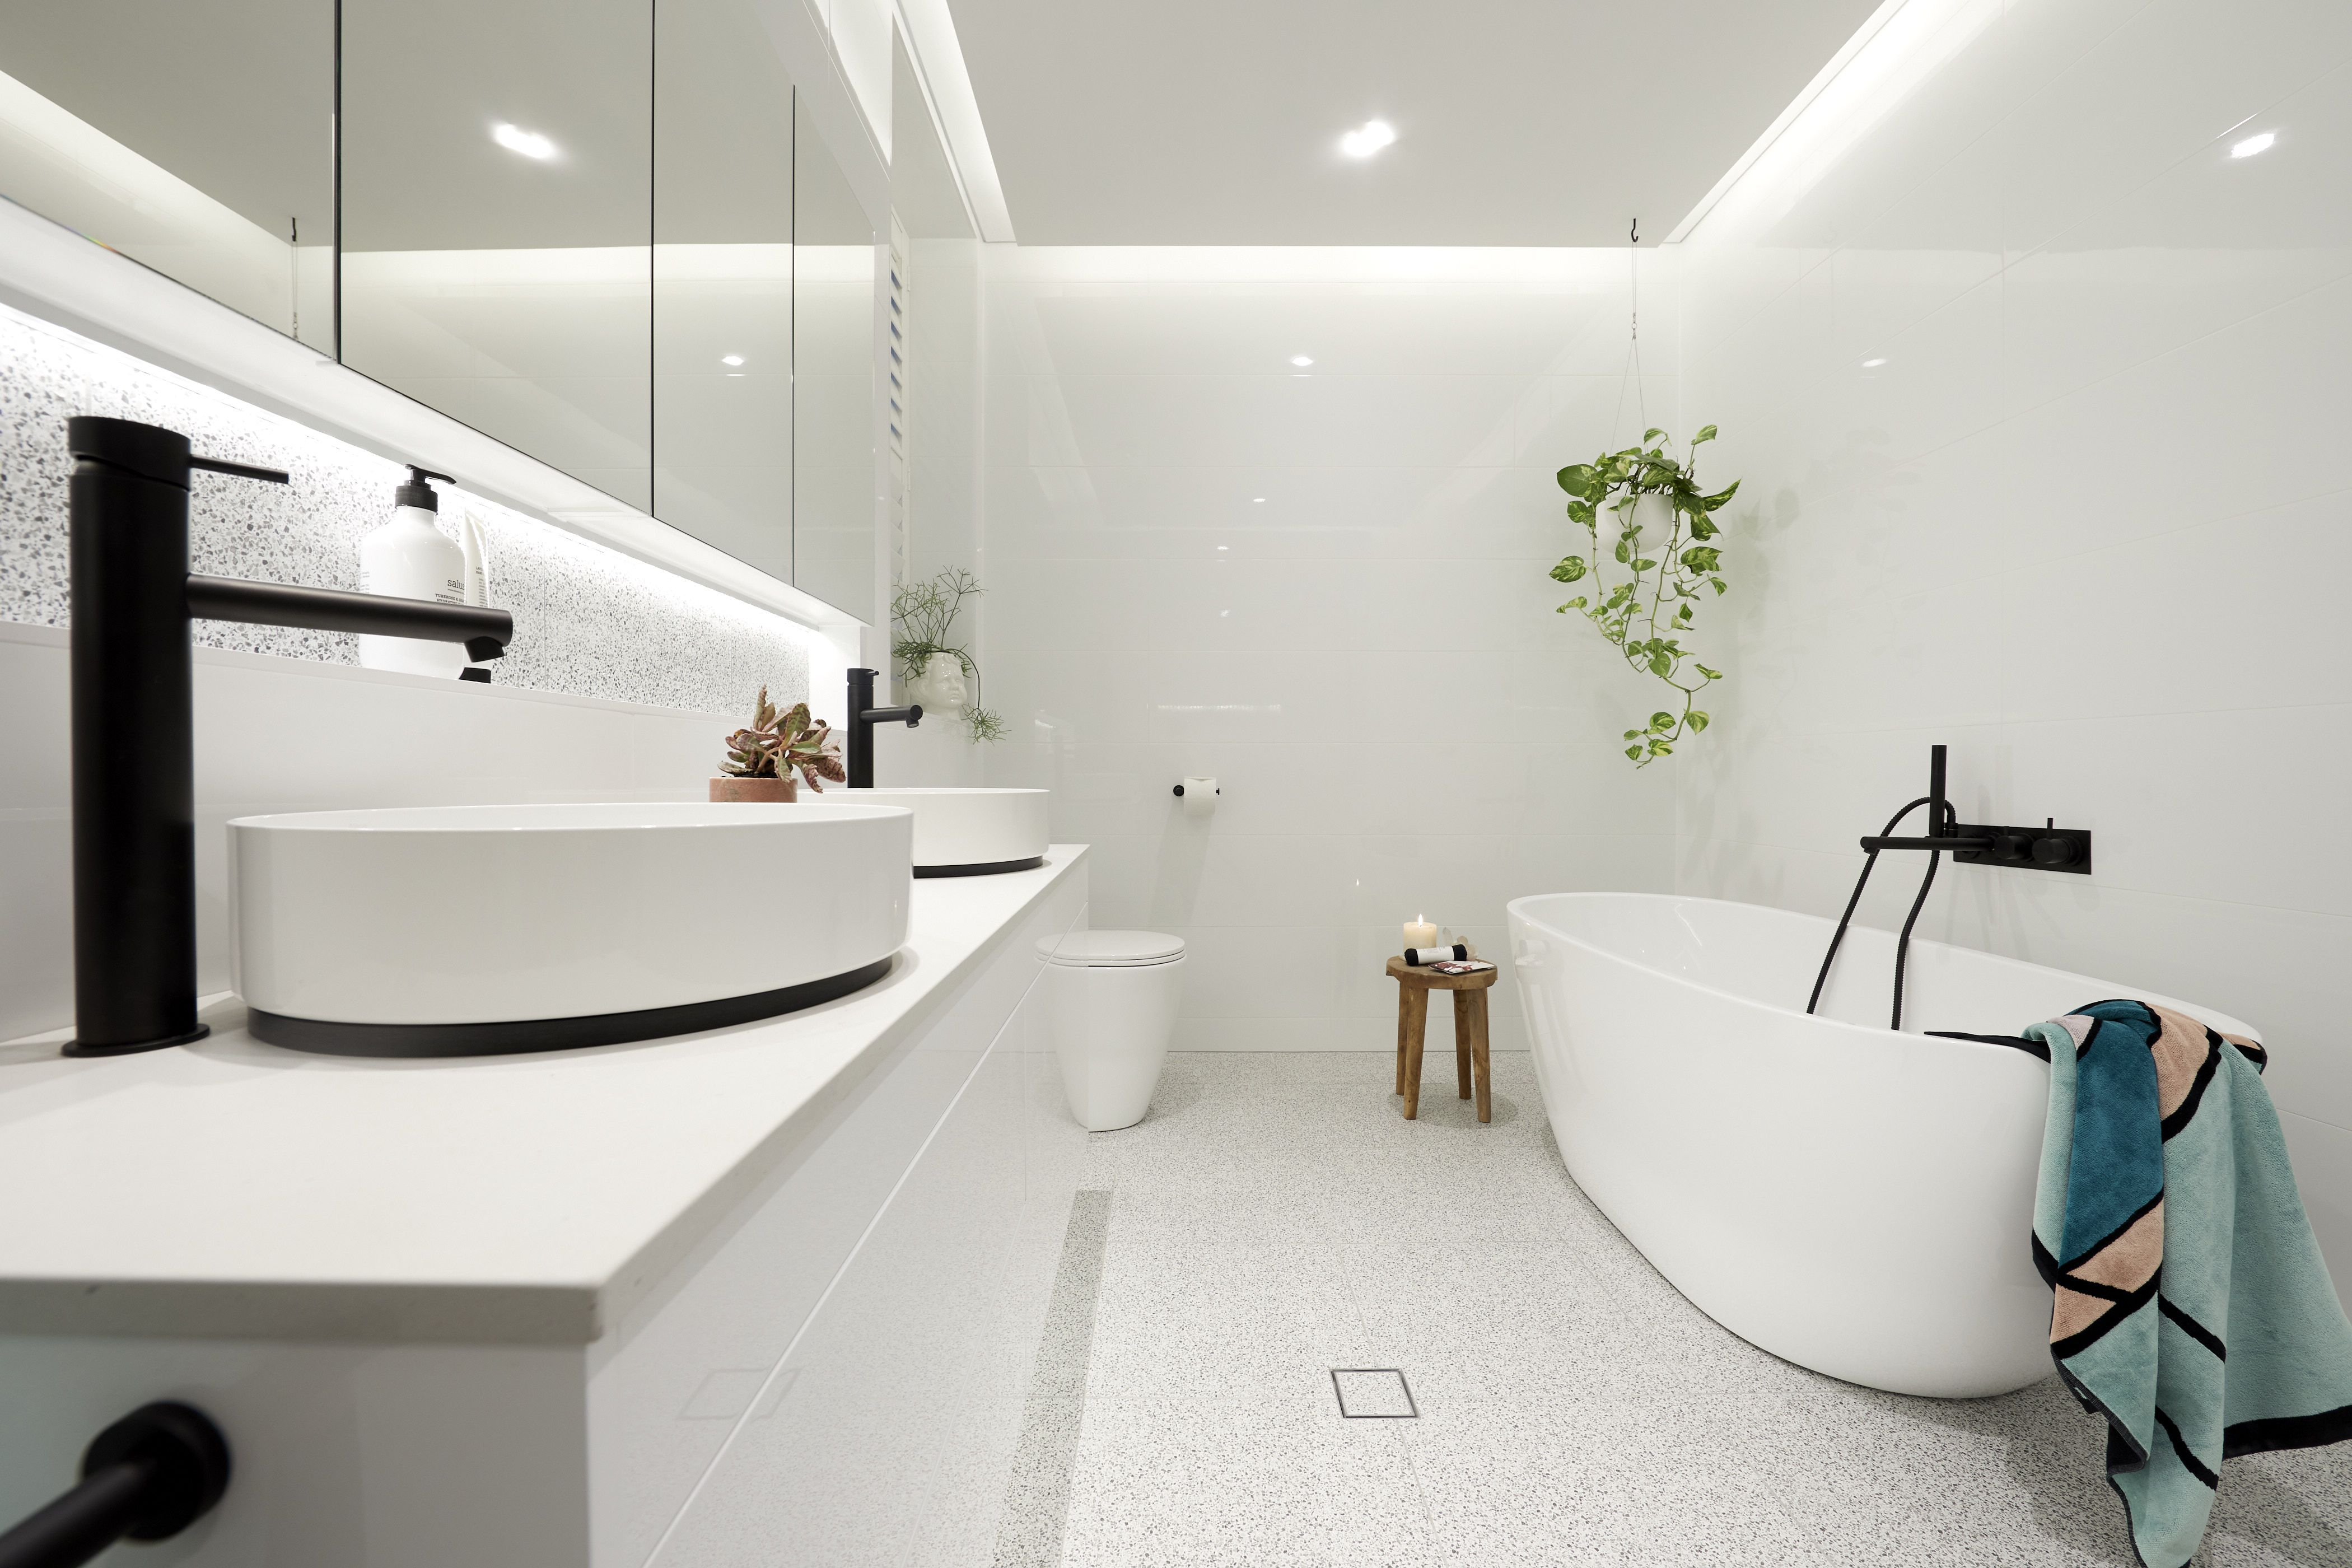 Badezimmerdesign 7 x 5 blockheads courtney u hans winning look   design  bathrooms in